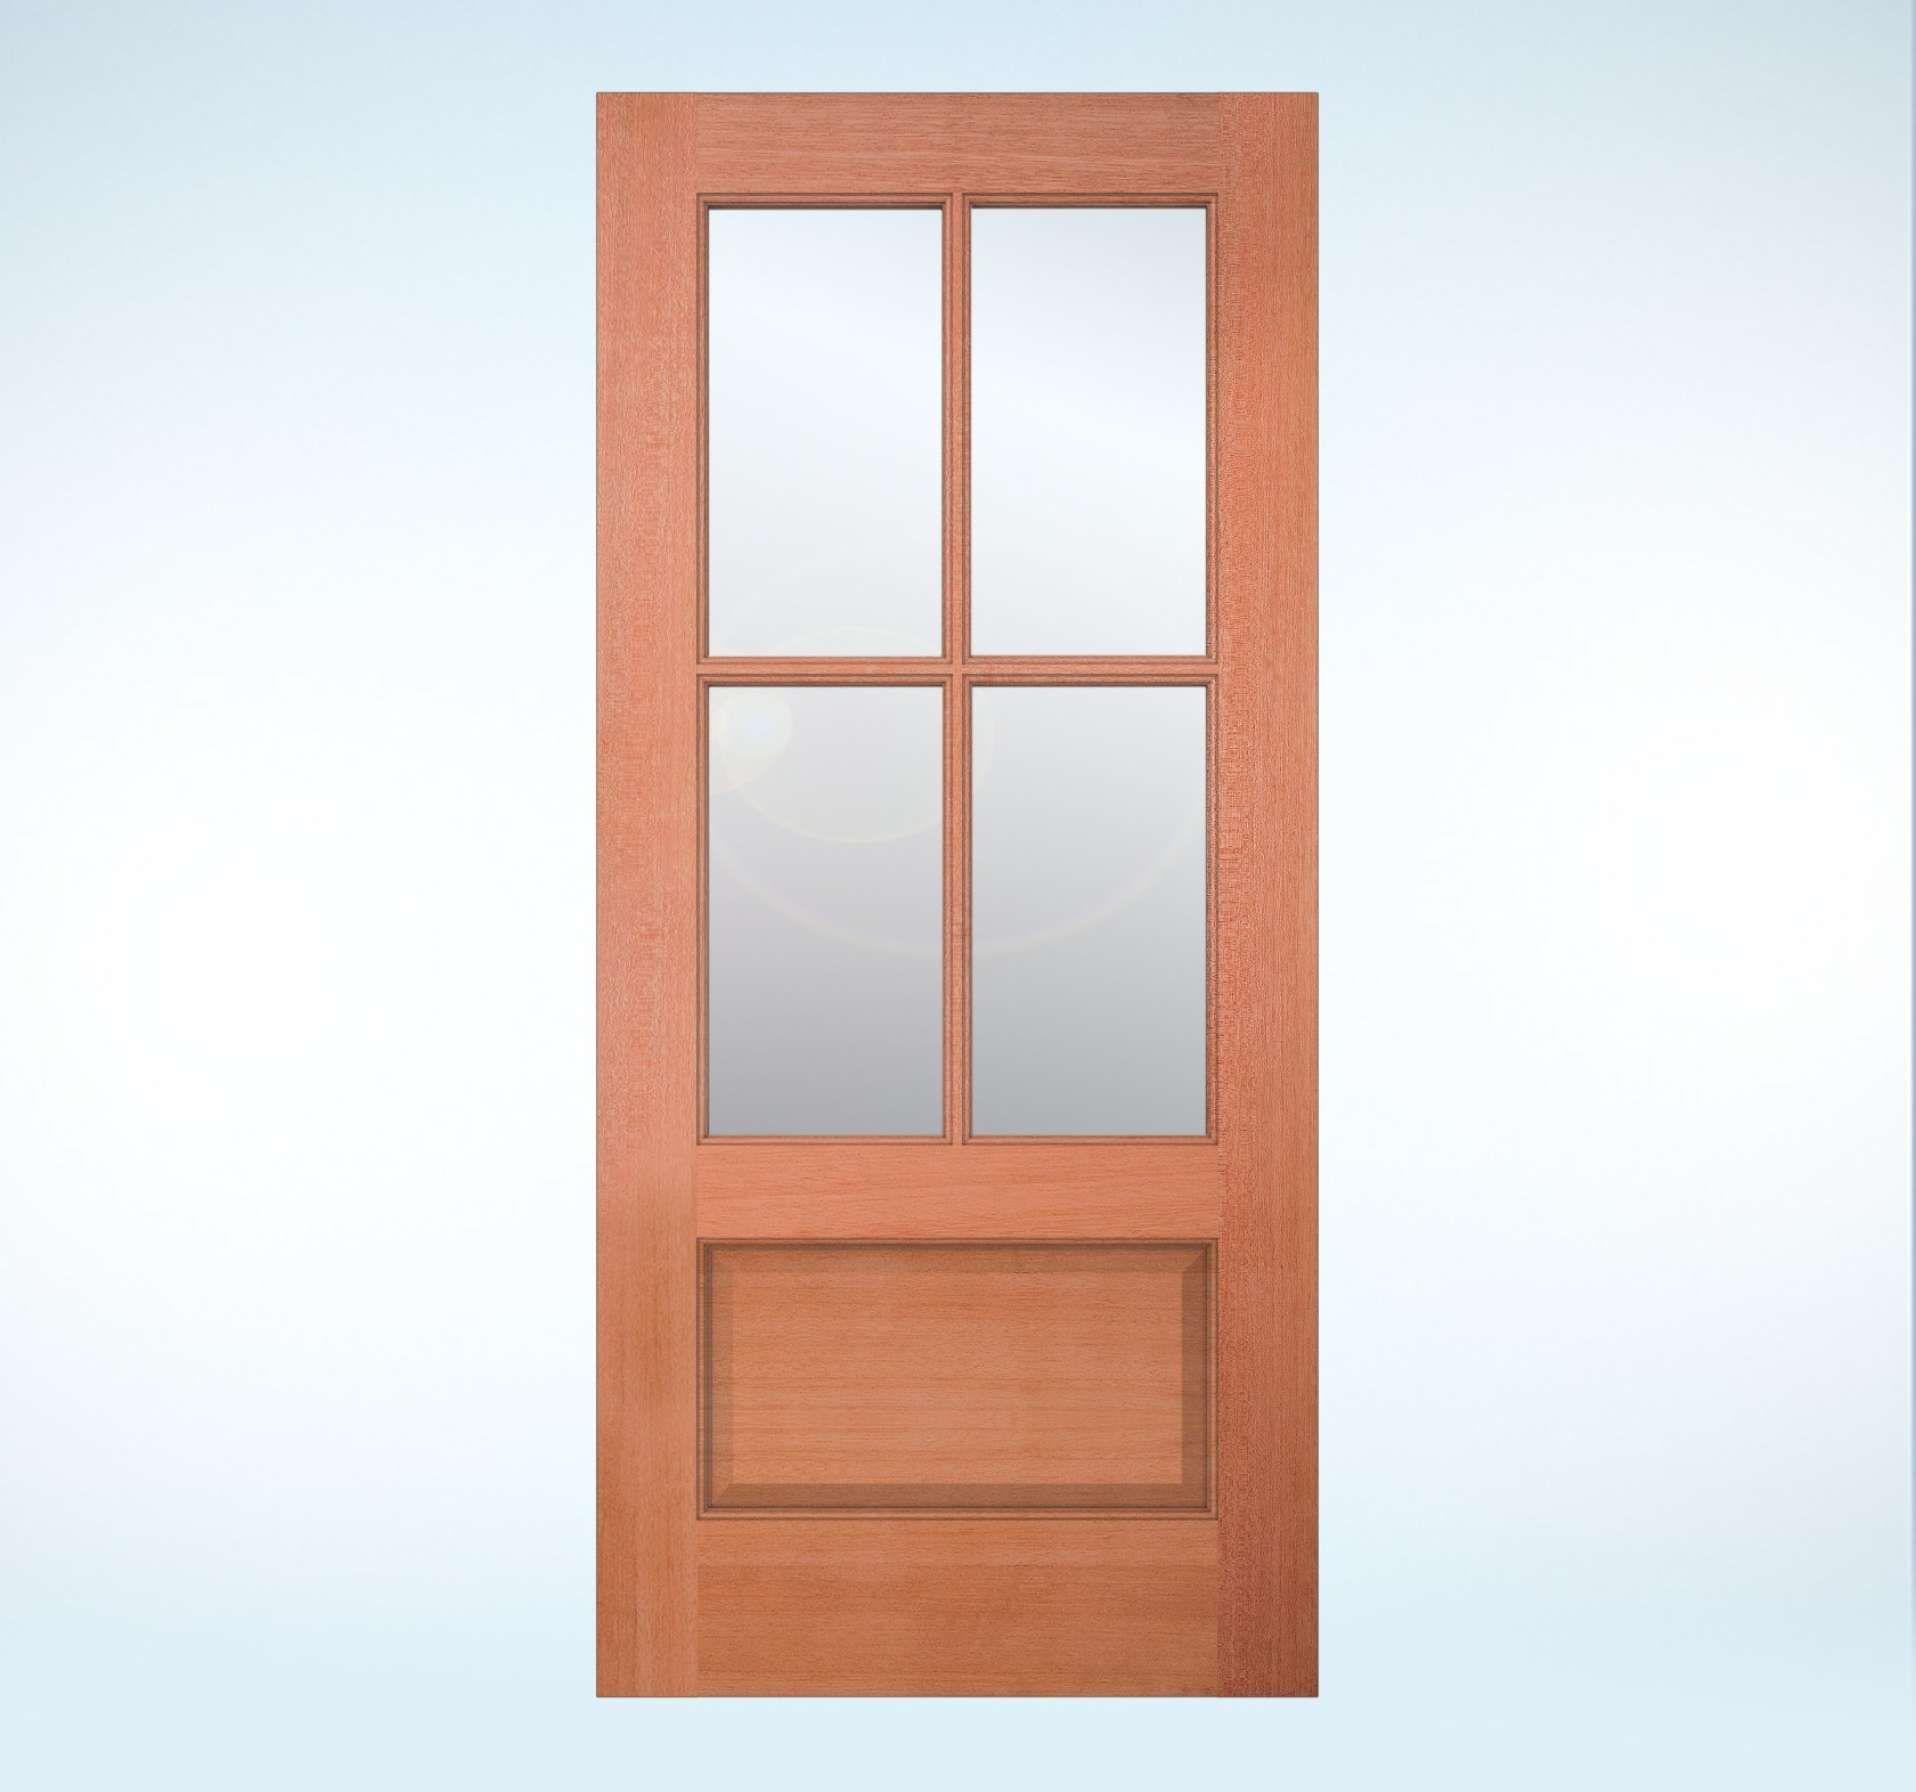 Jeld wen model 5104 wood glass panel exterior door in meranti mahogany for the back exterior - Exterior back doors with glass ...